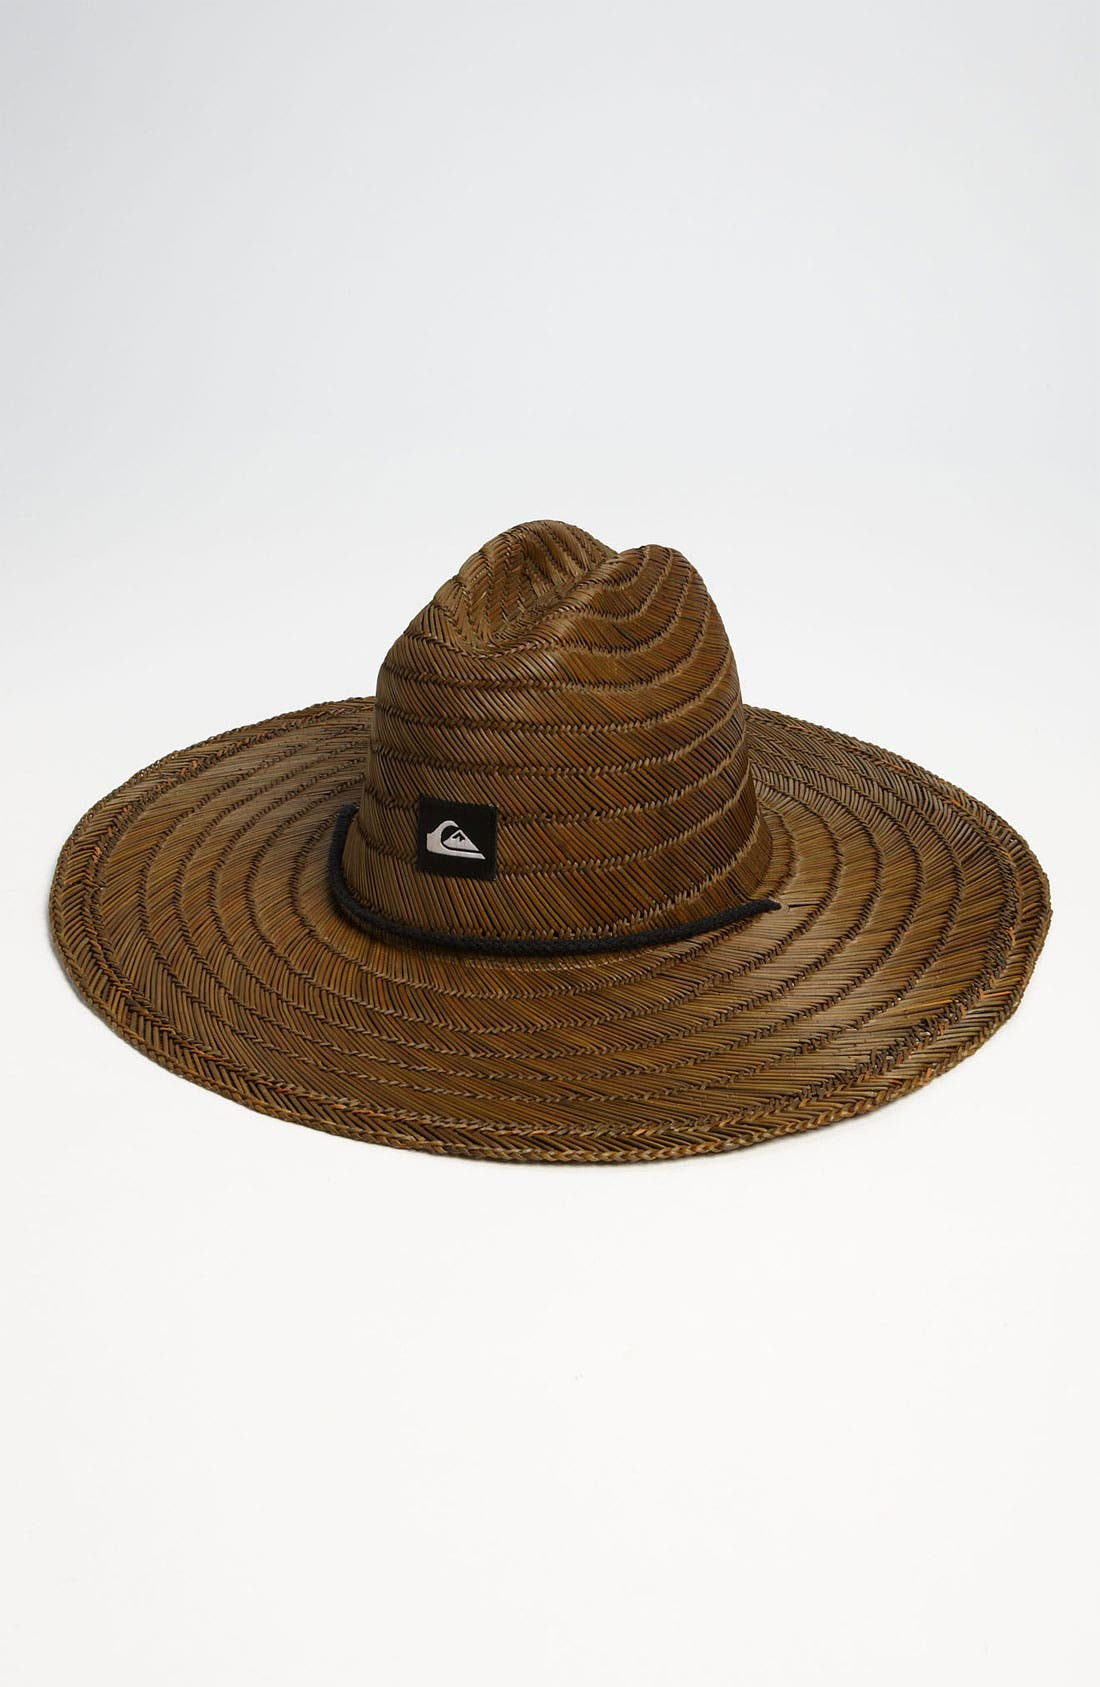 Main Image - Quiksilver 'Pierside' Straw Hat